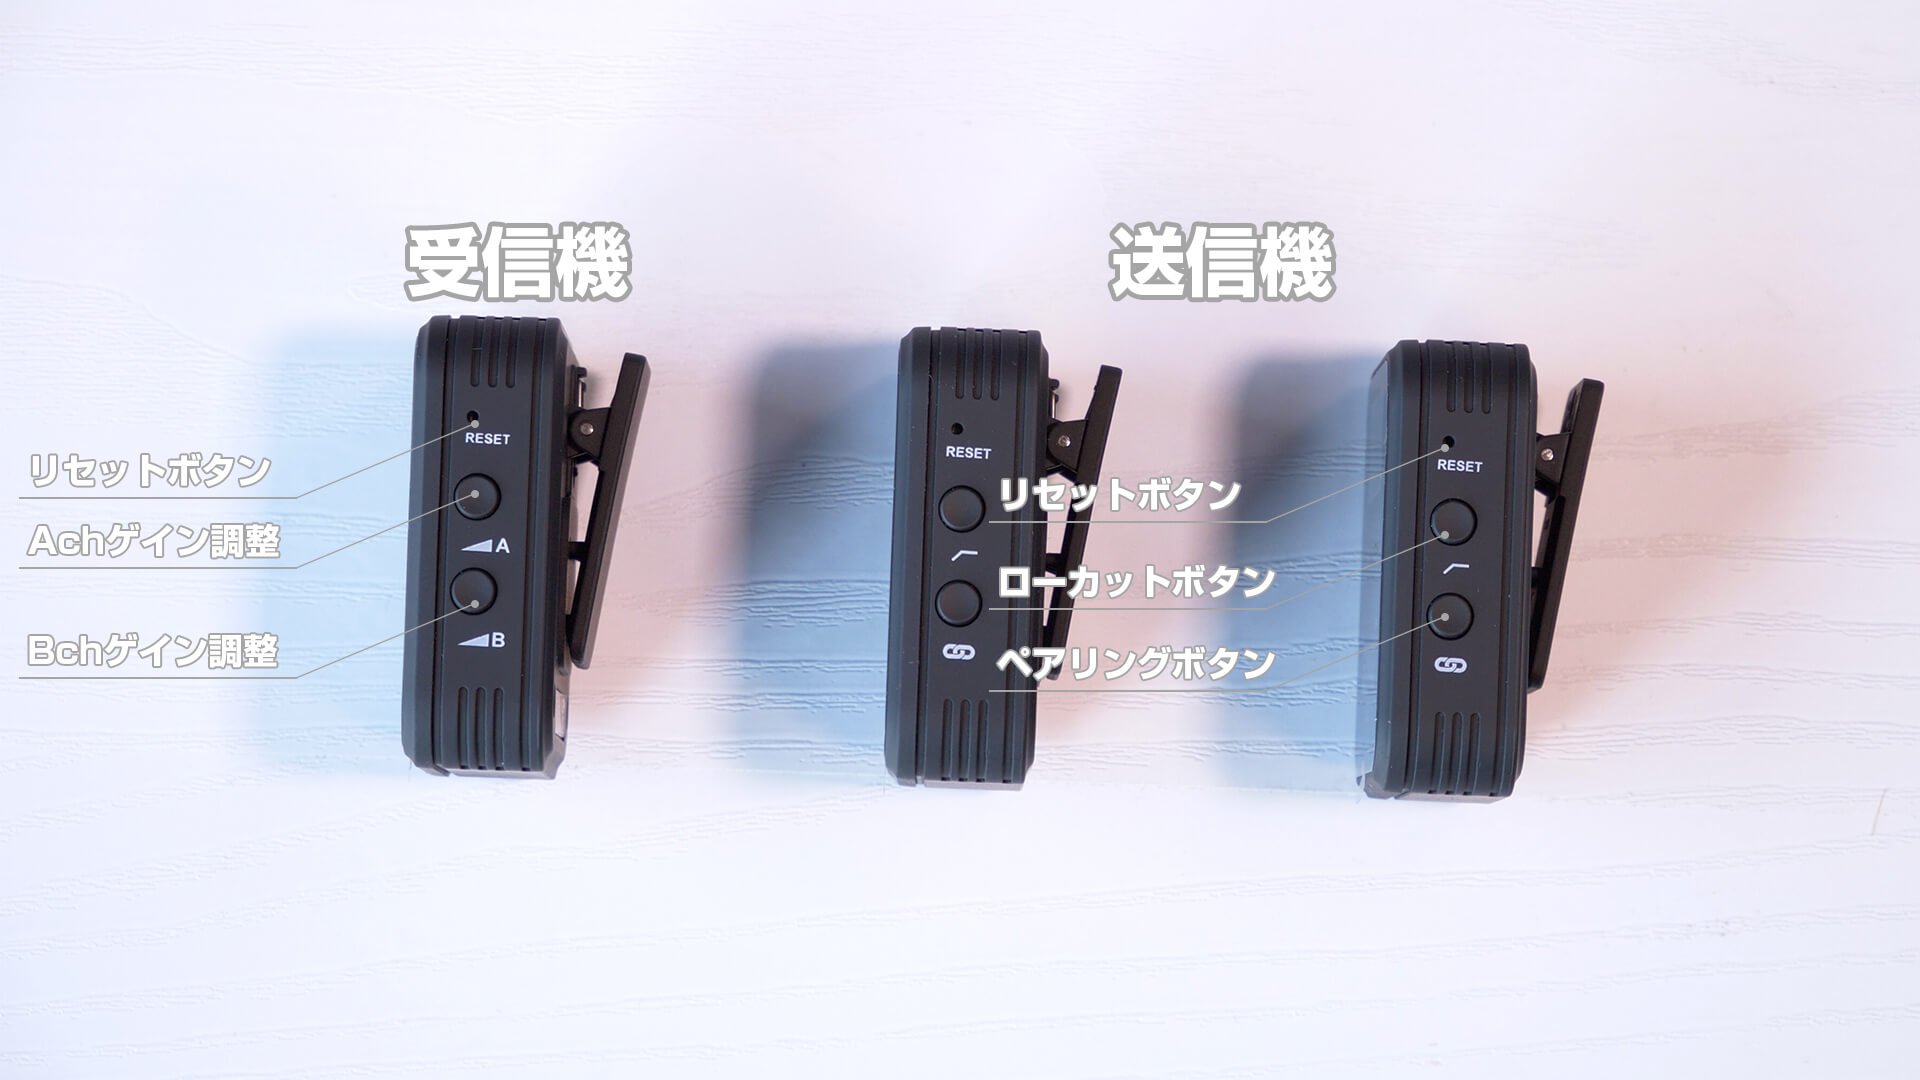 SYNCO G2(A2) 受信機と送信機の右側面